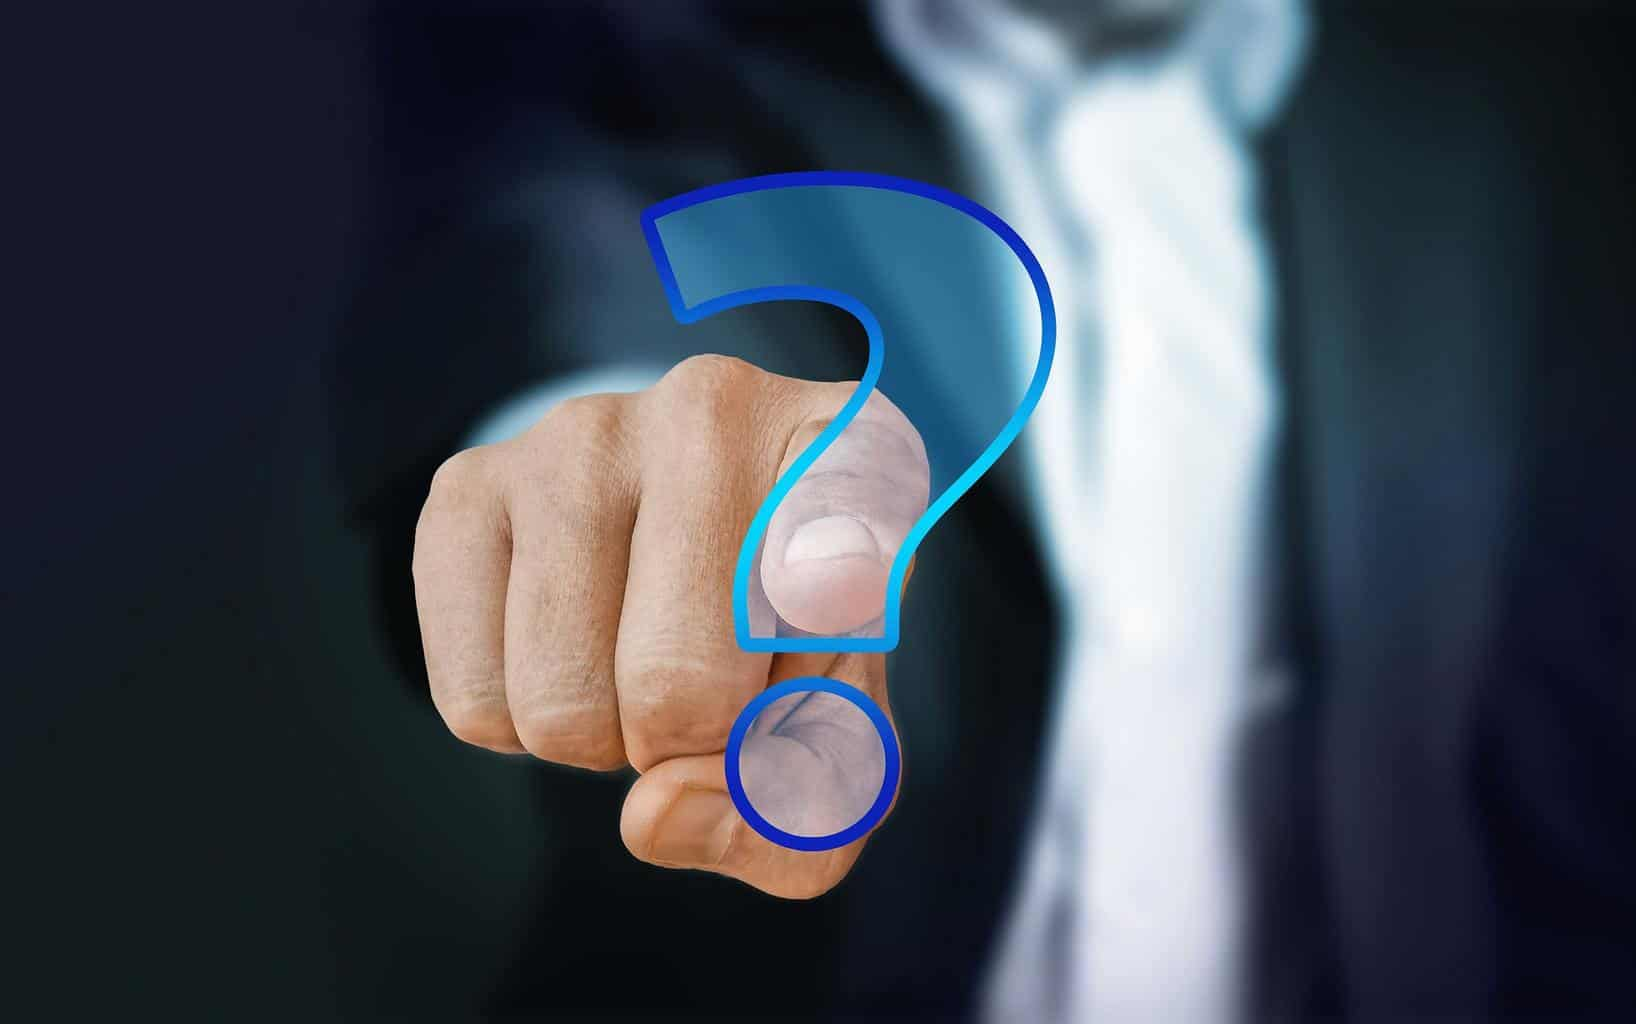 【Q&A】20代の転職で気になる疑問点を解決